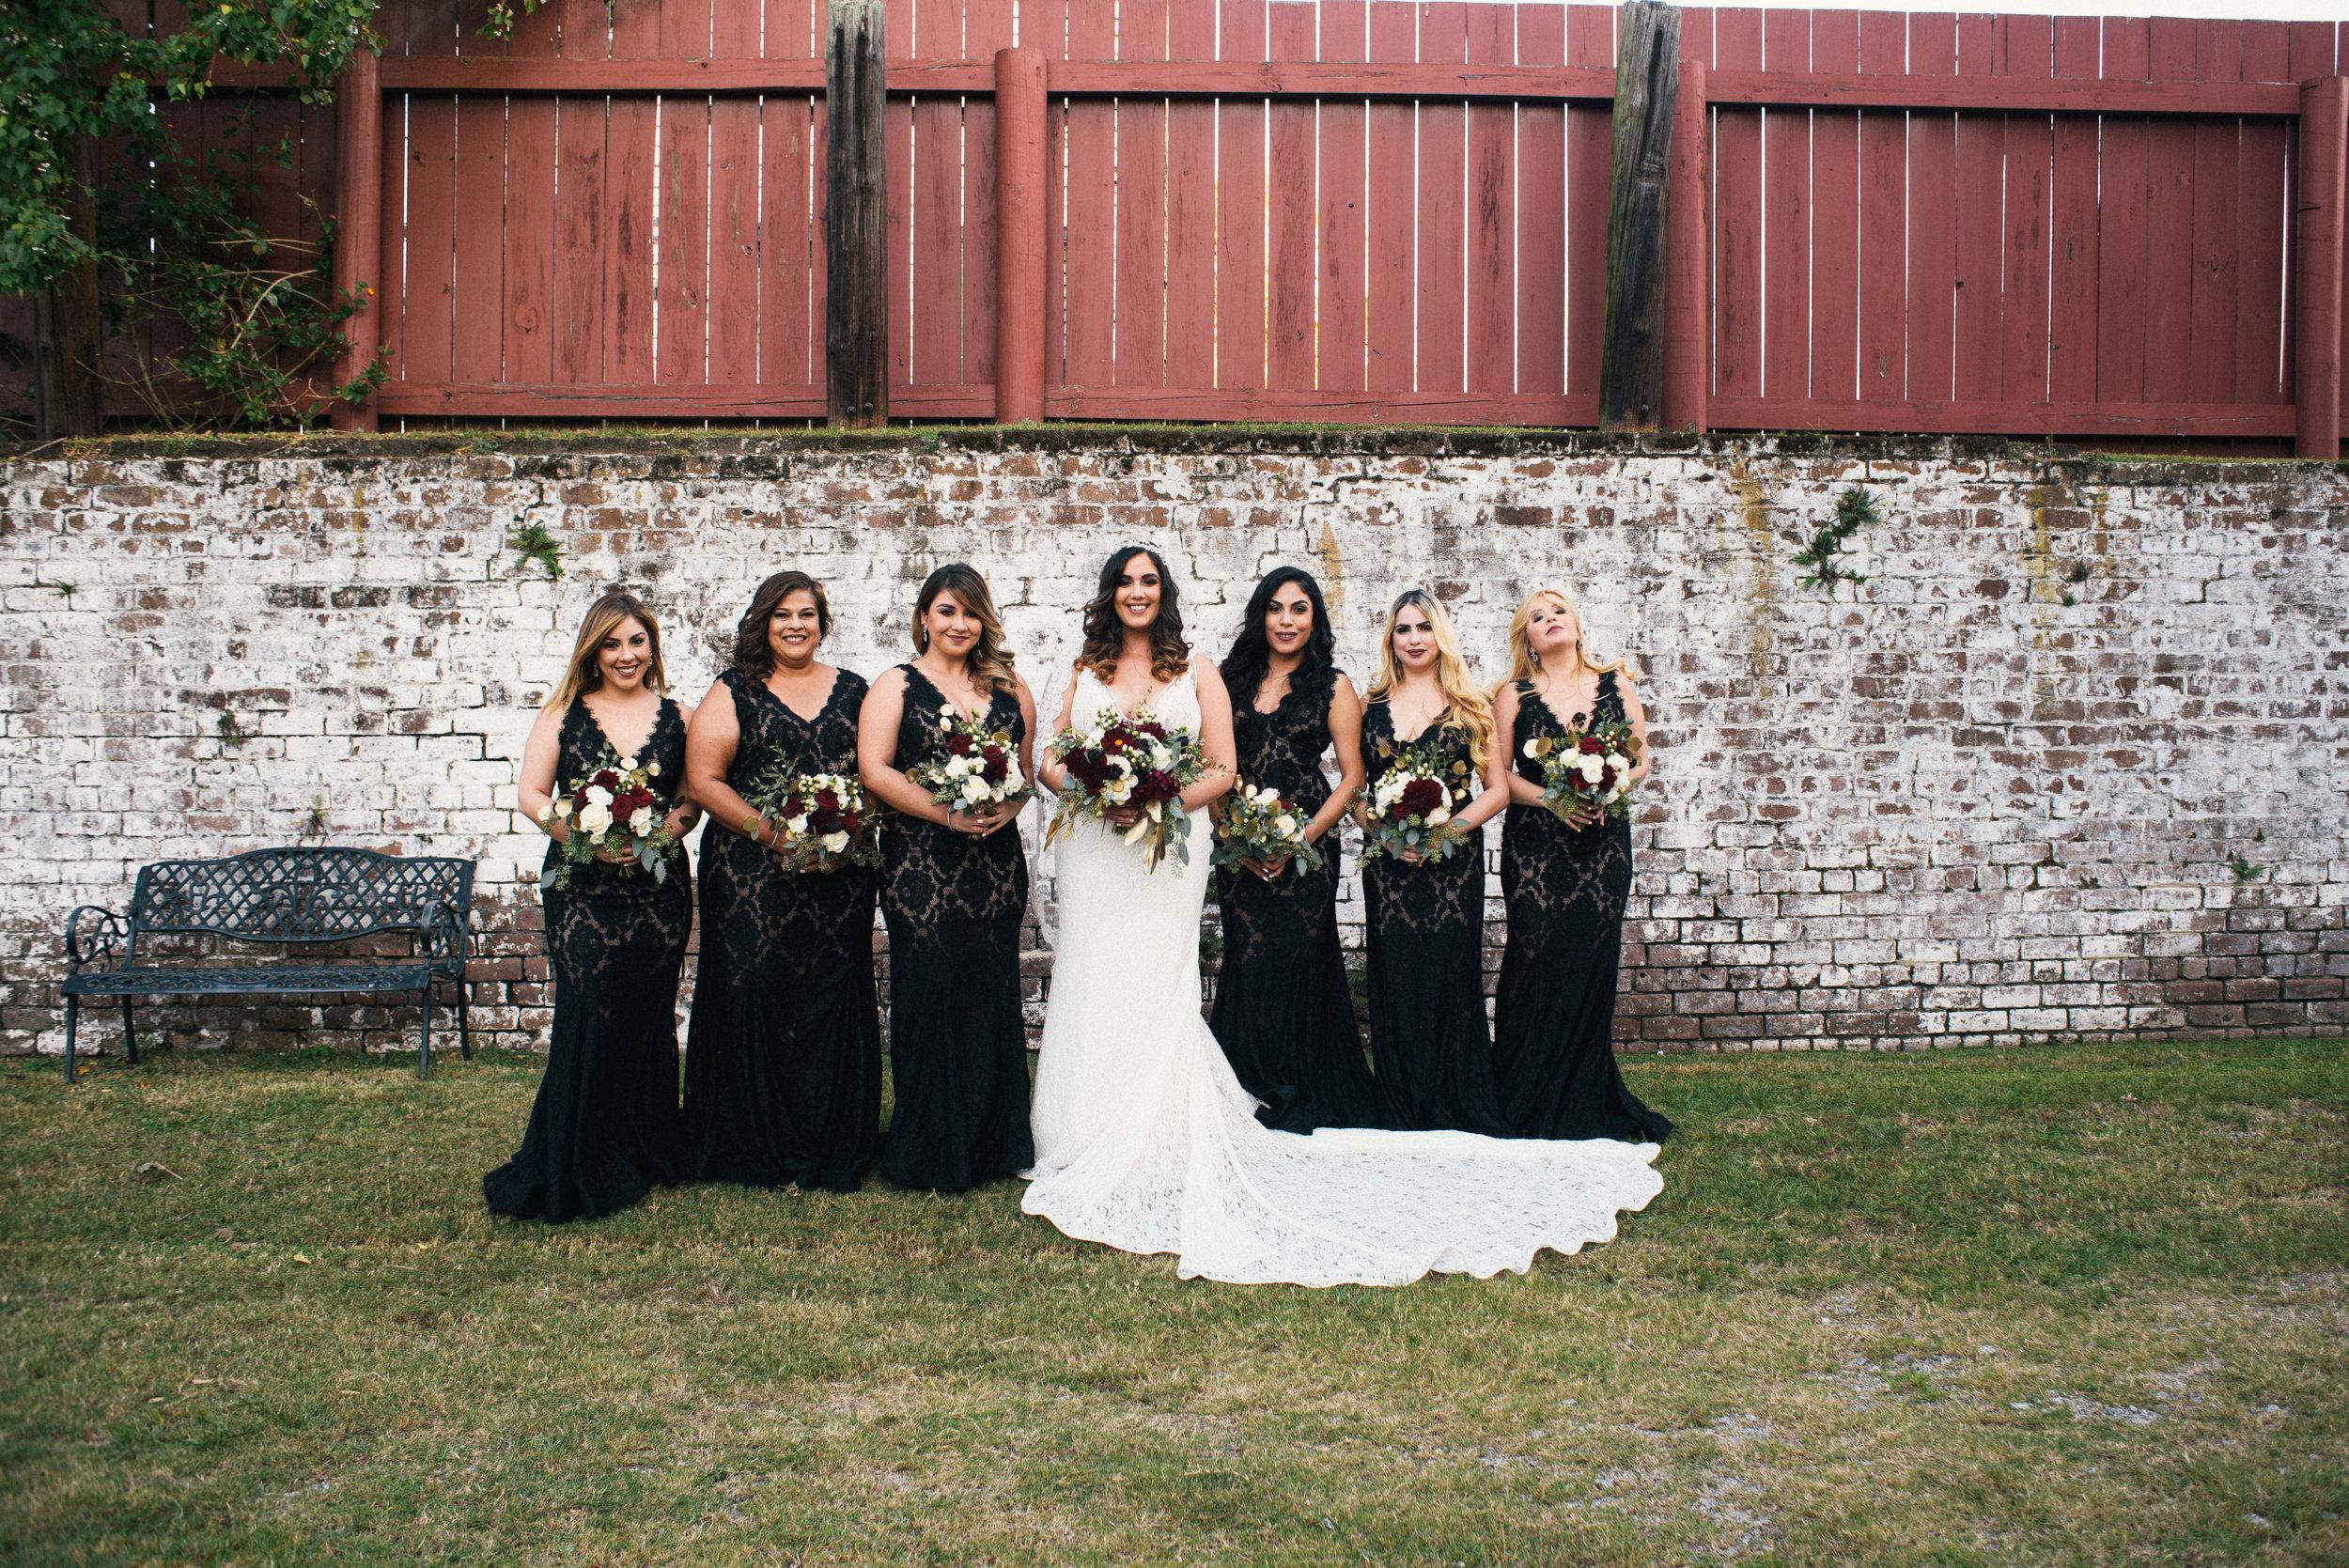 Iggy-and-yesenia-savannah-railroad-museum-wedding-meg-hill-photo- (581 of 1037).jpg